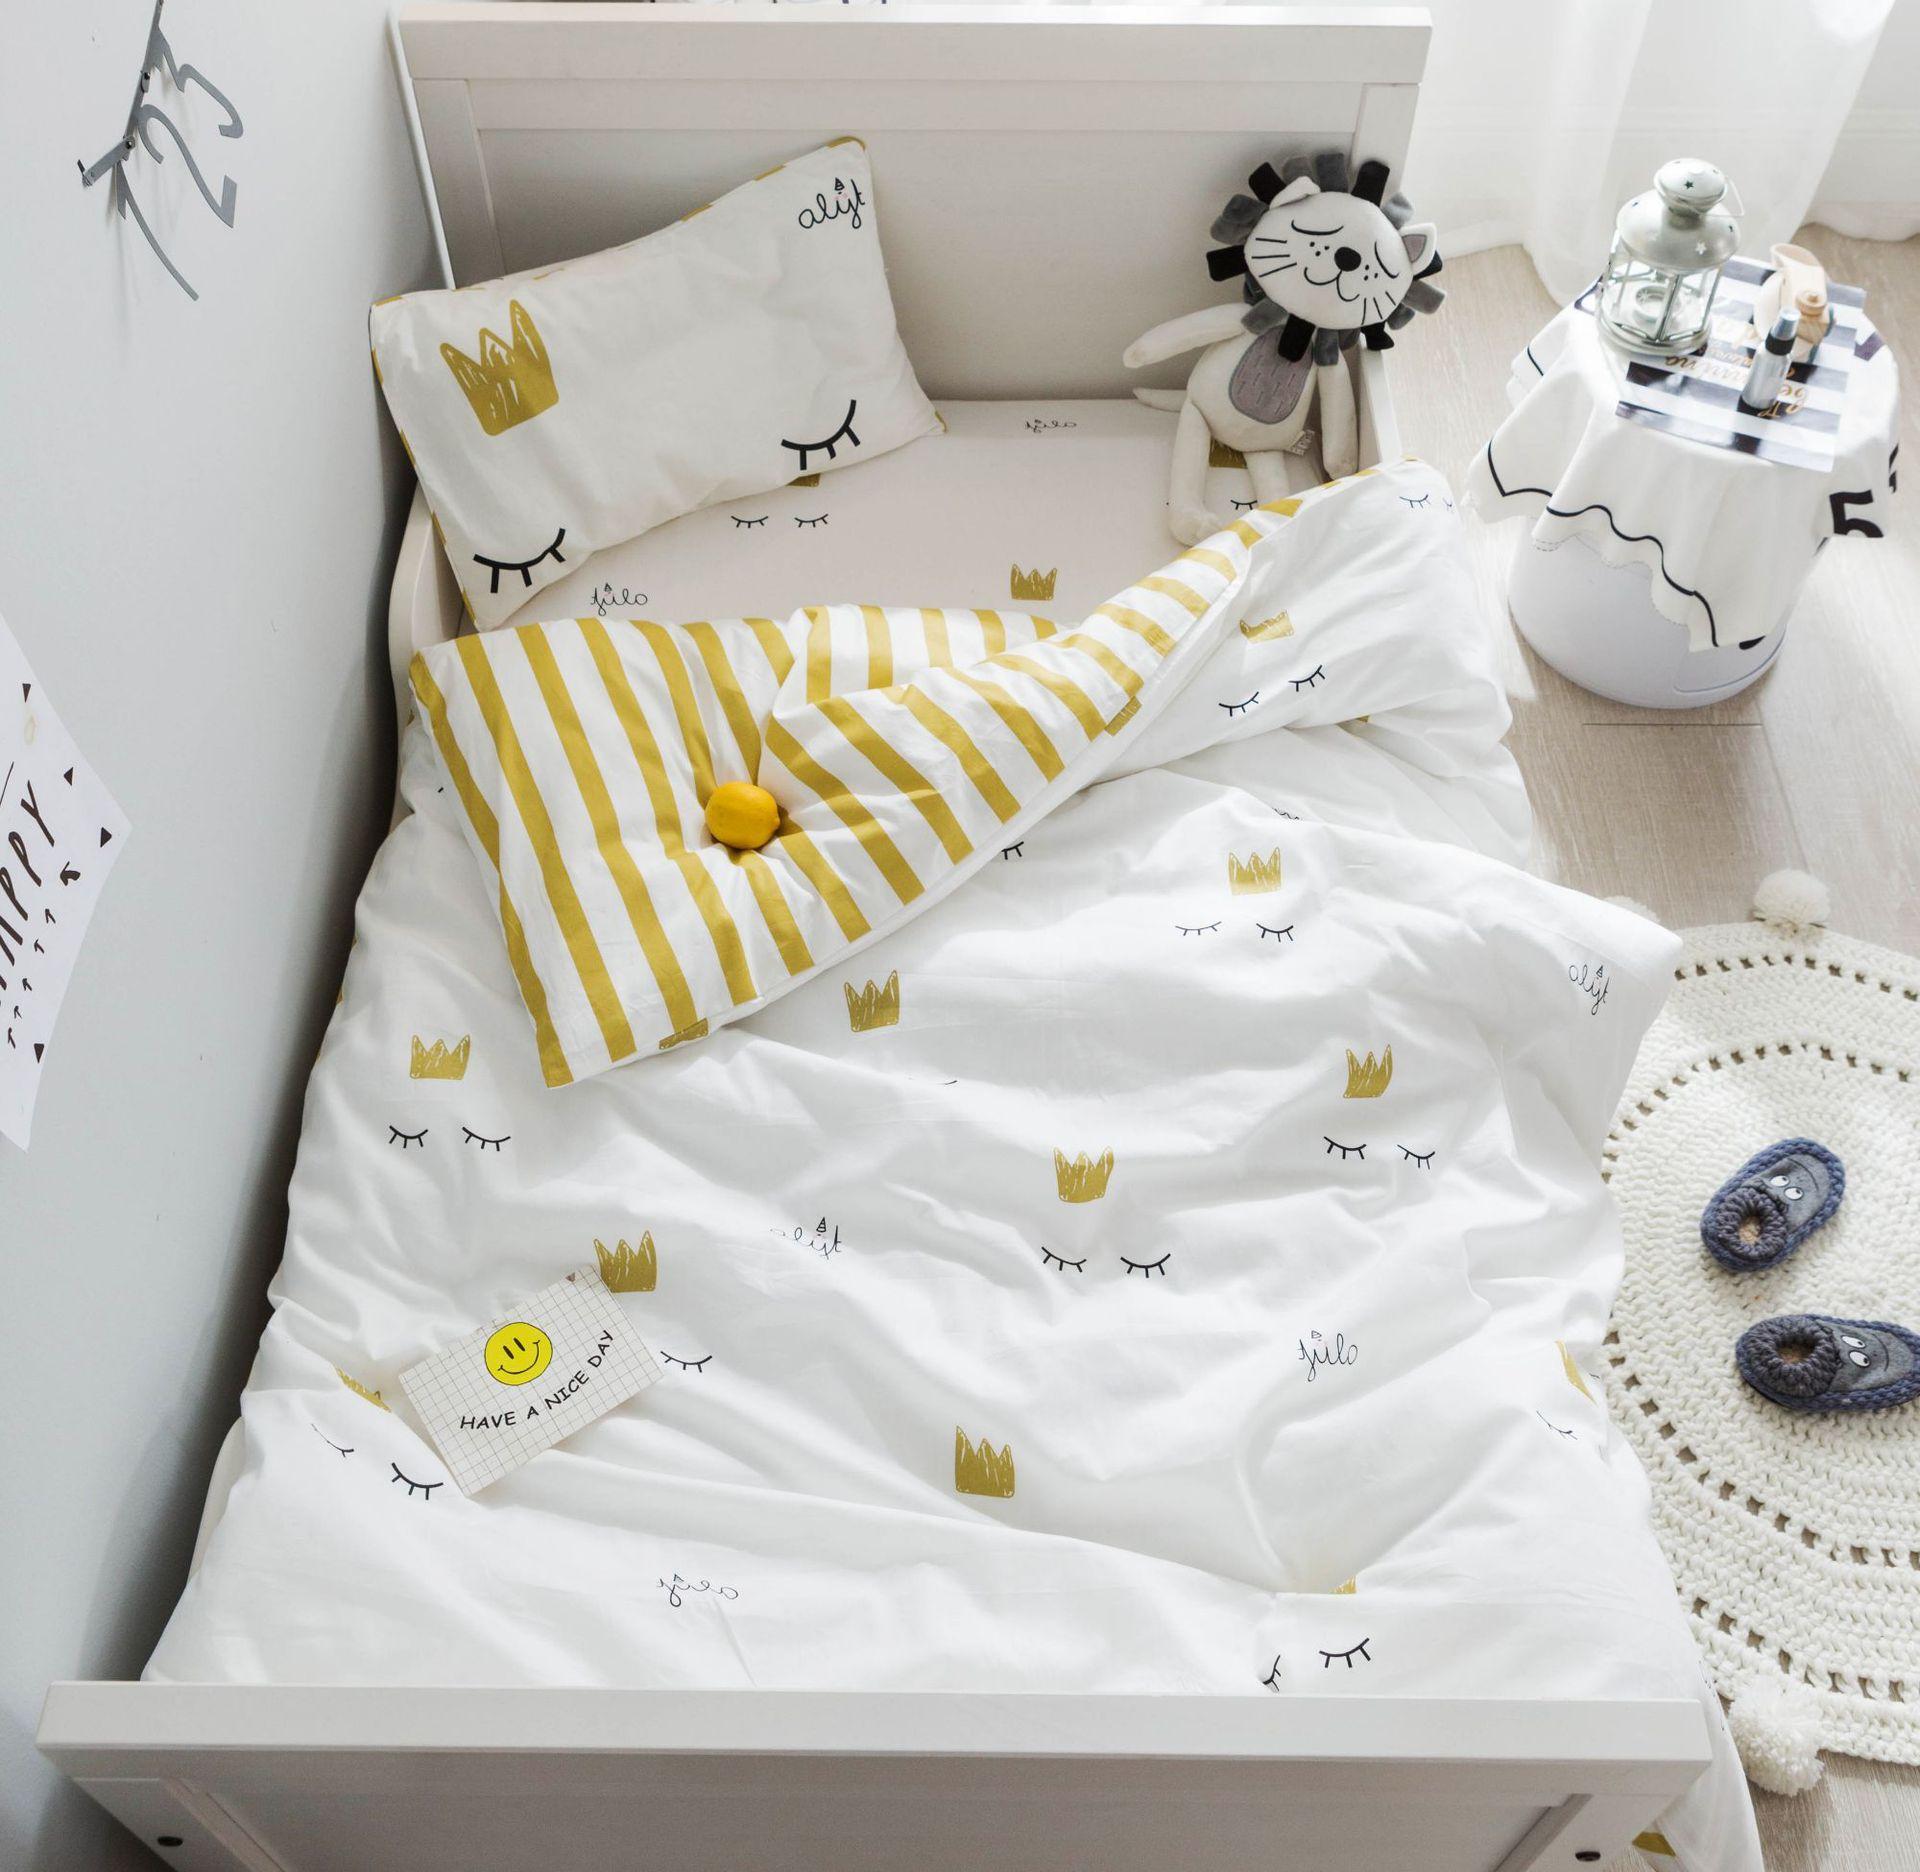 3Pcs Baby Bedding Set For Boy Girl Cartoon Soft Cotton Crib Bed Linen Set Include Pillowcase Bed Sheet Duvet Cover No Filler